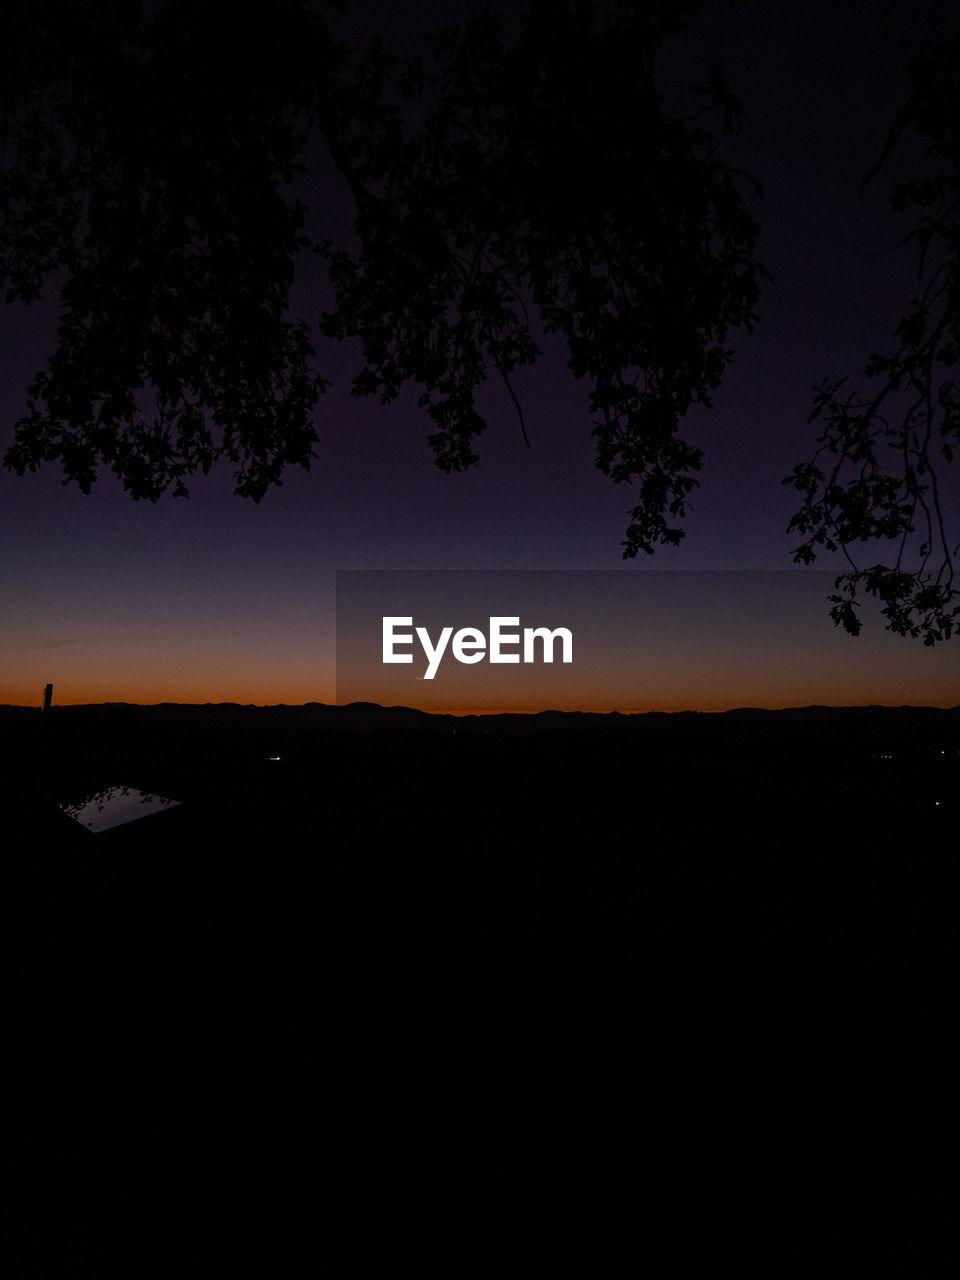 sky, tree, silhouette, scenics - nature, beauty in nature, tranquil scene, tranquility, nature, plant, environment, landscape, night, no people, sunset, outdoors, non-urban scene, dark, dusk, land, idyllic